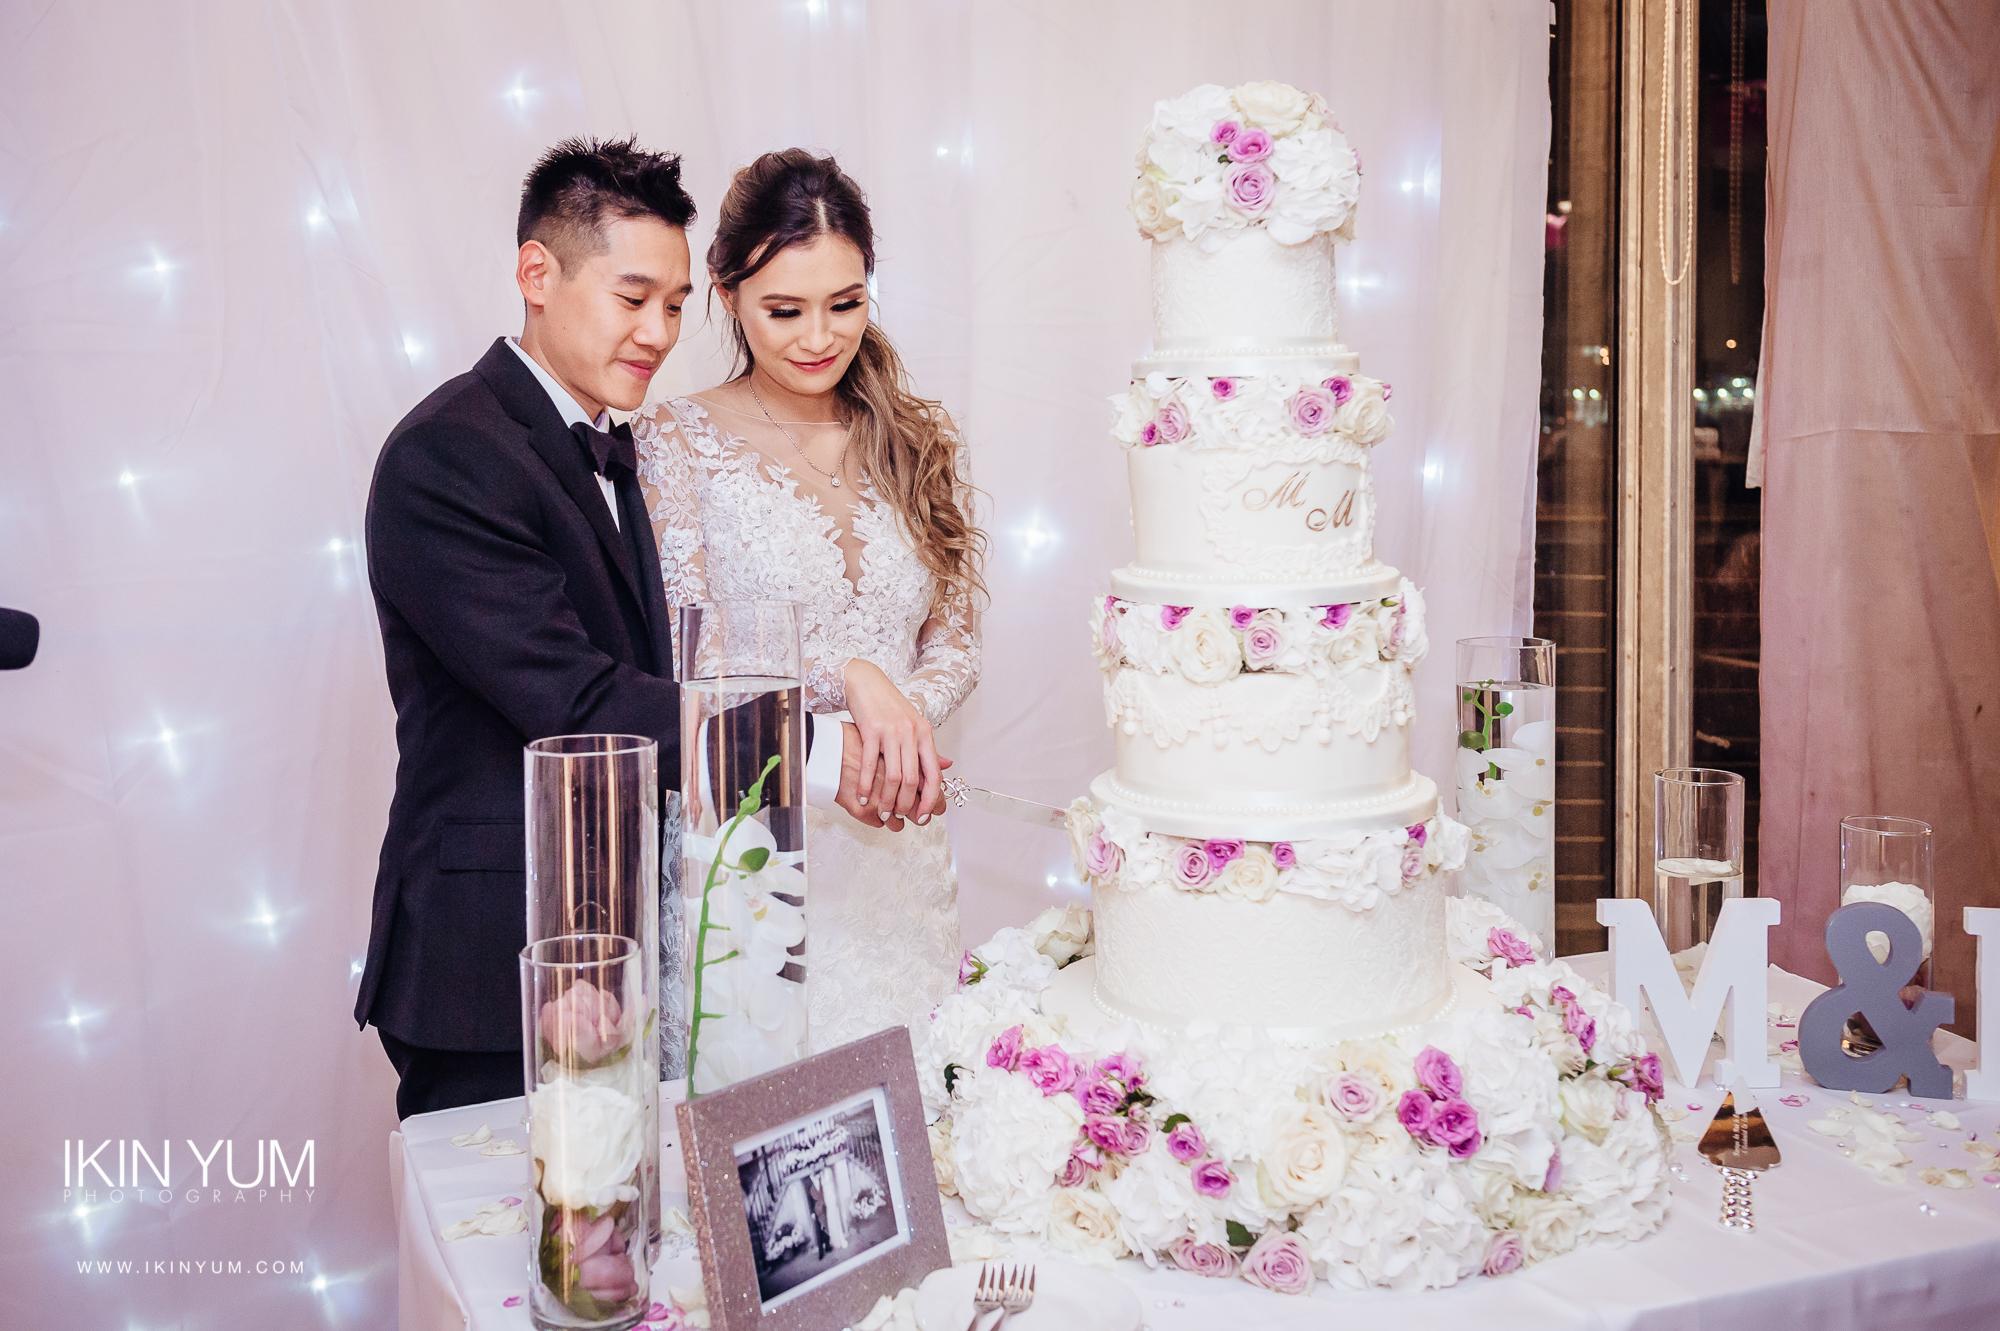 Syon Park Wedding - Ikin Yum Photography -130.jpg